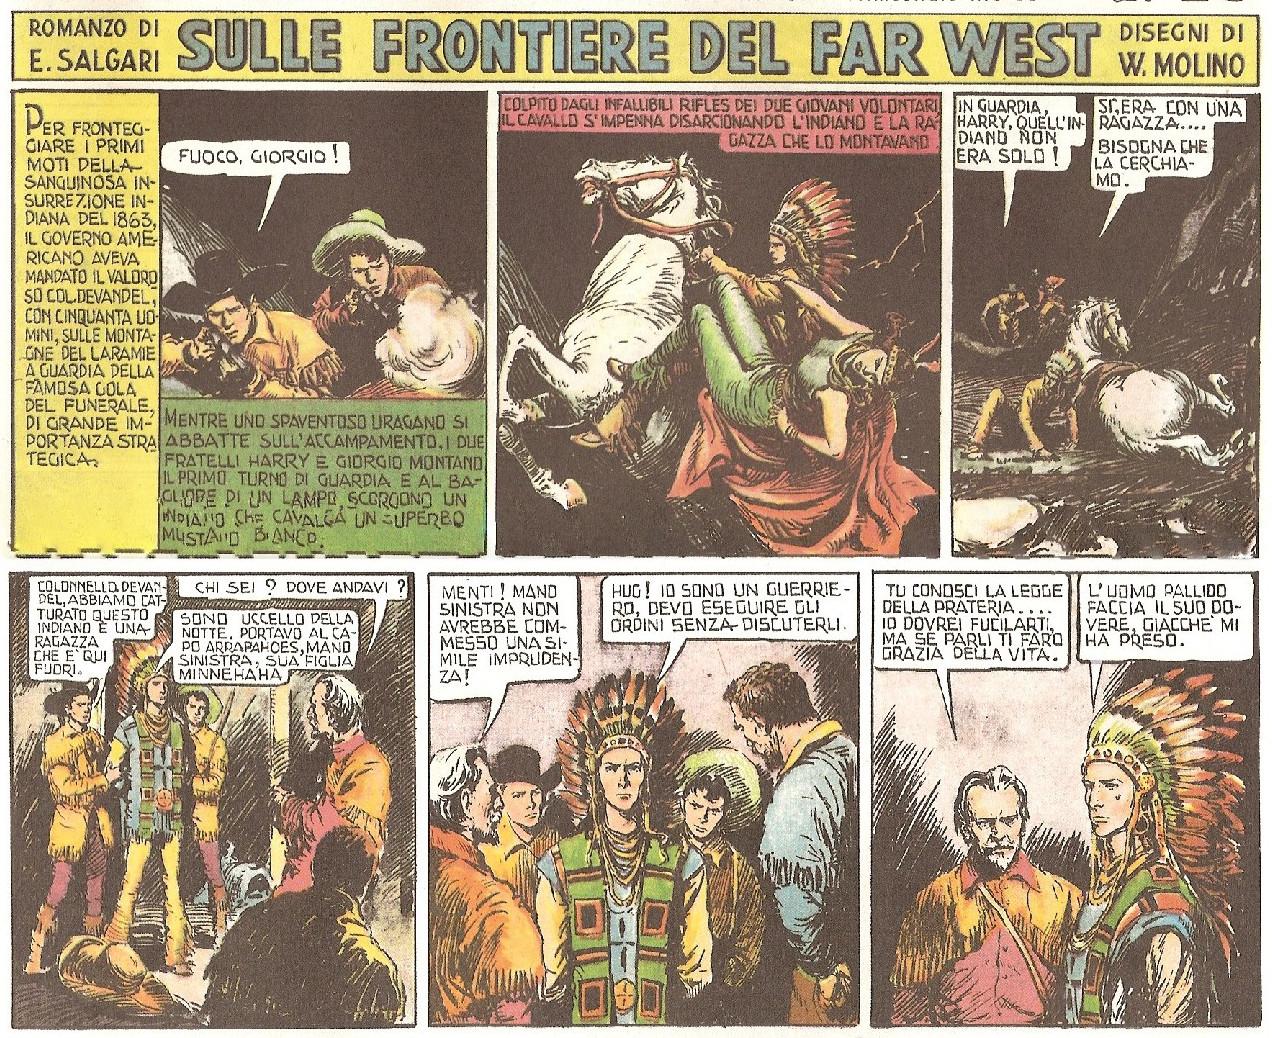 « Sulle frontiere del Far West » par Walter Molino - d'après Emilio Salgari.